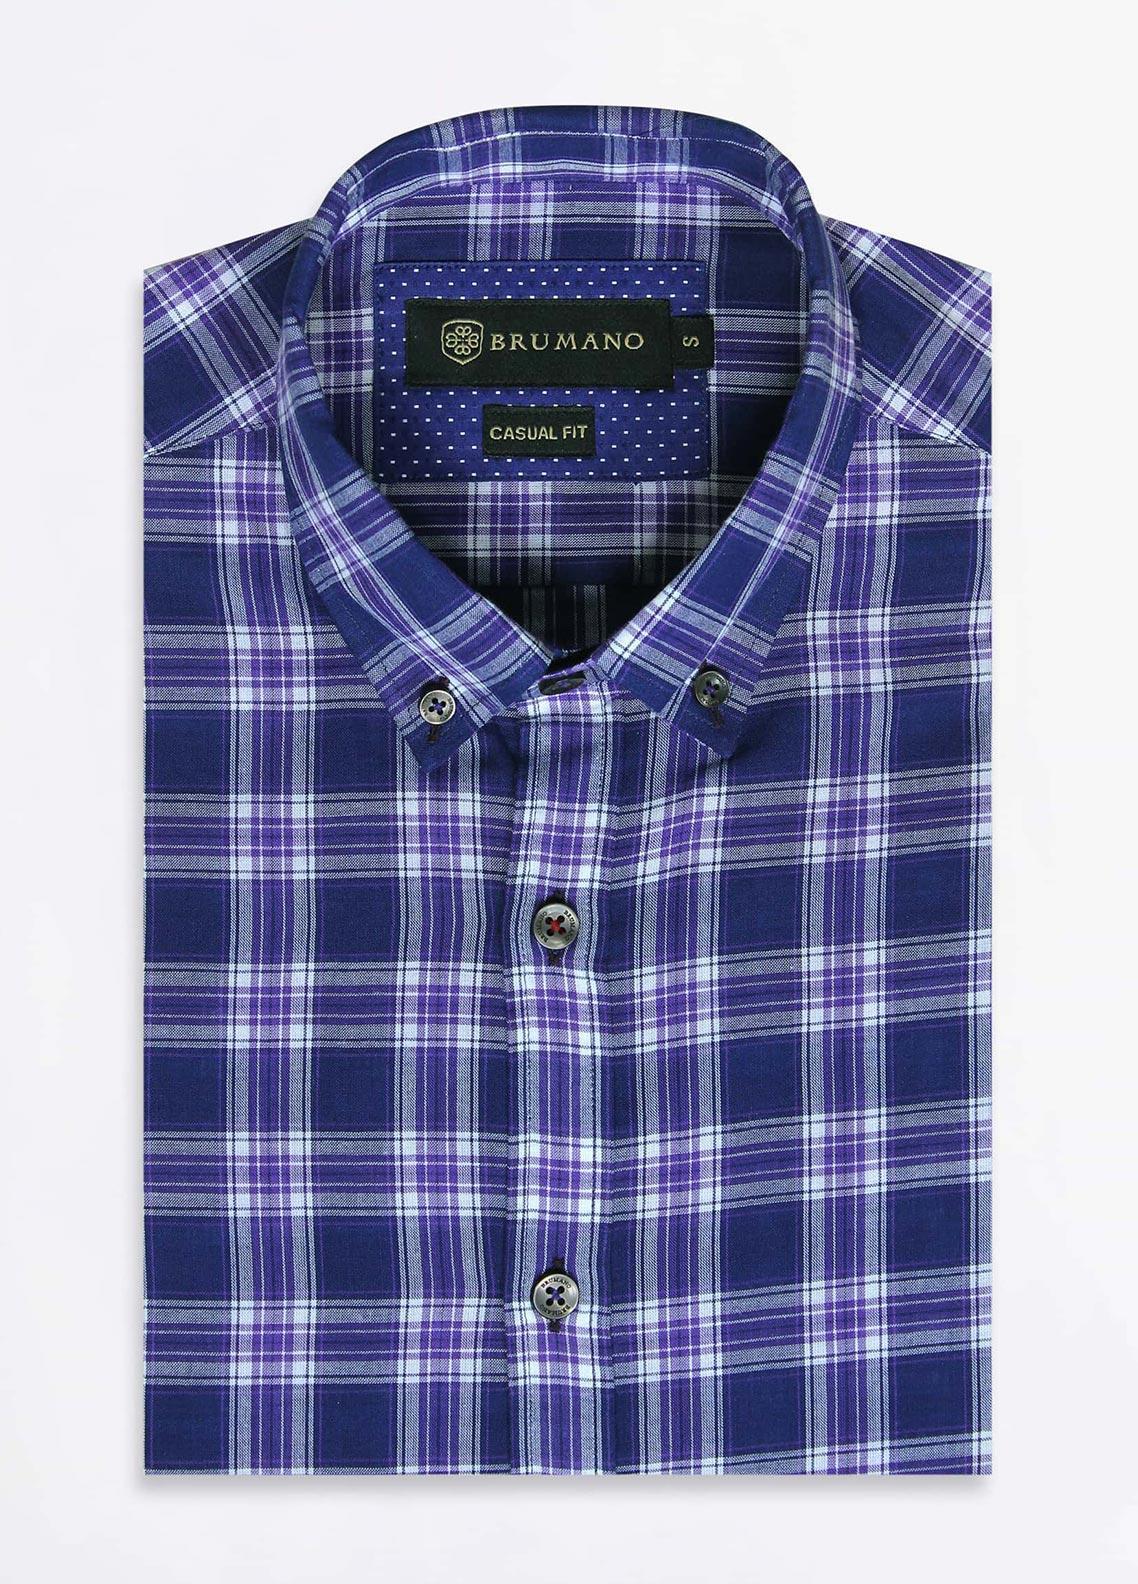 Brumano Cotton Formal Shirts for Men -  BRM-1003